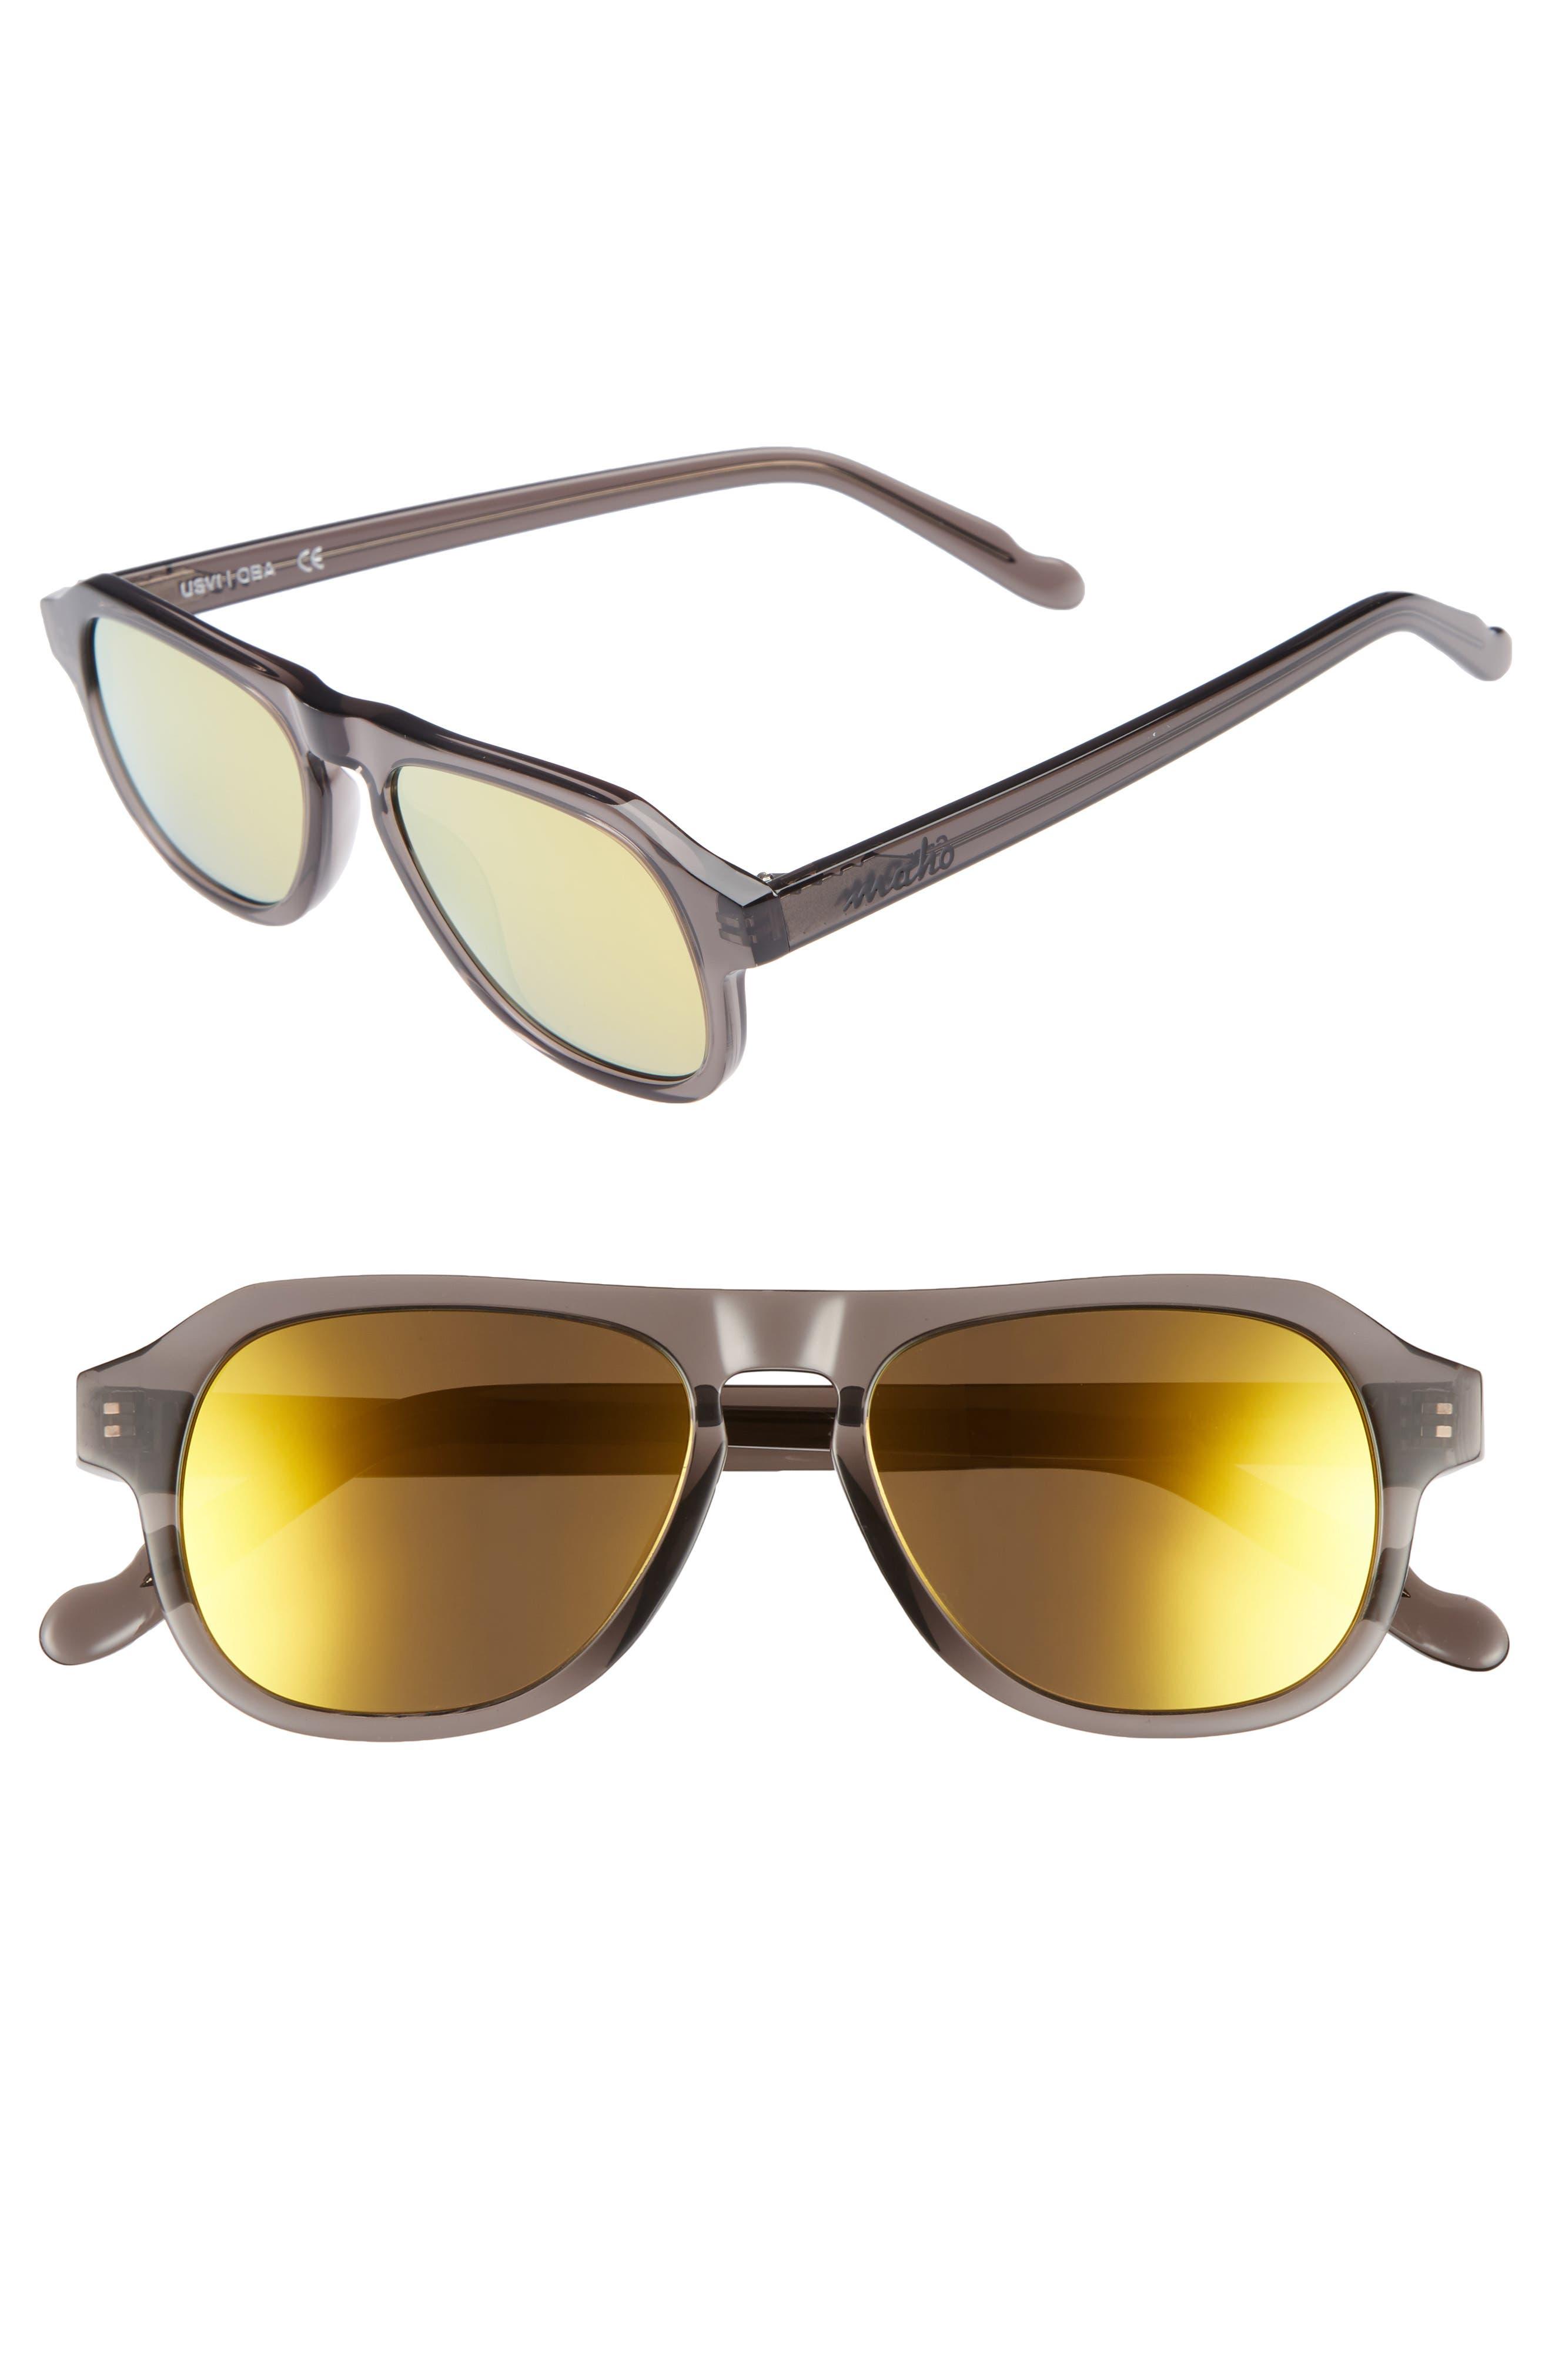 Galapagos 48mm Polarized Flat Top Sunglasses,                         Main,                         color, 020